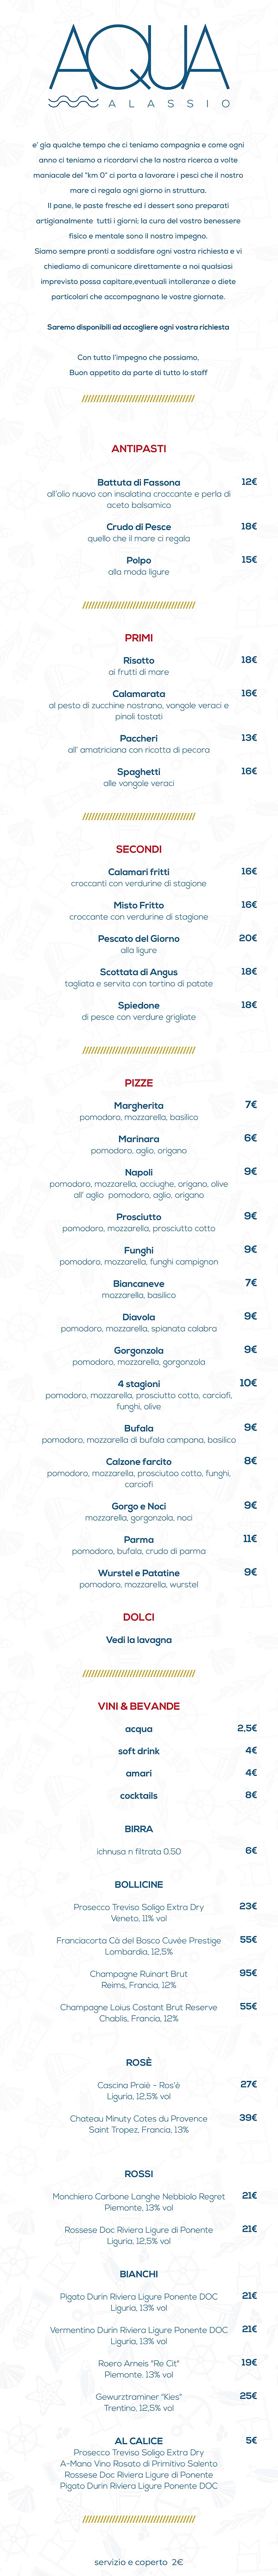 menu_aqua_cena_14_maggio_2021.jpg